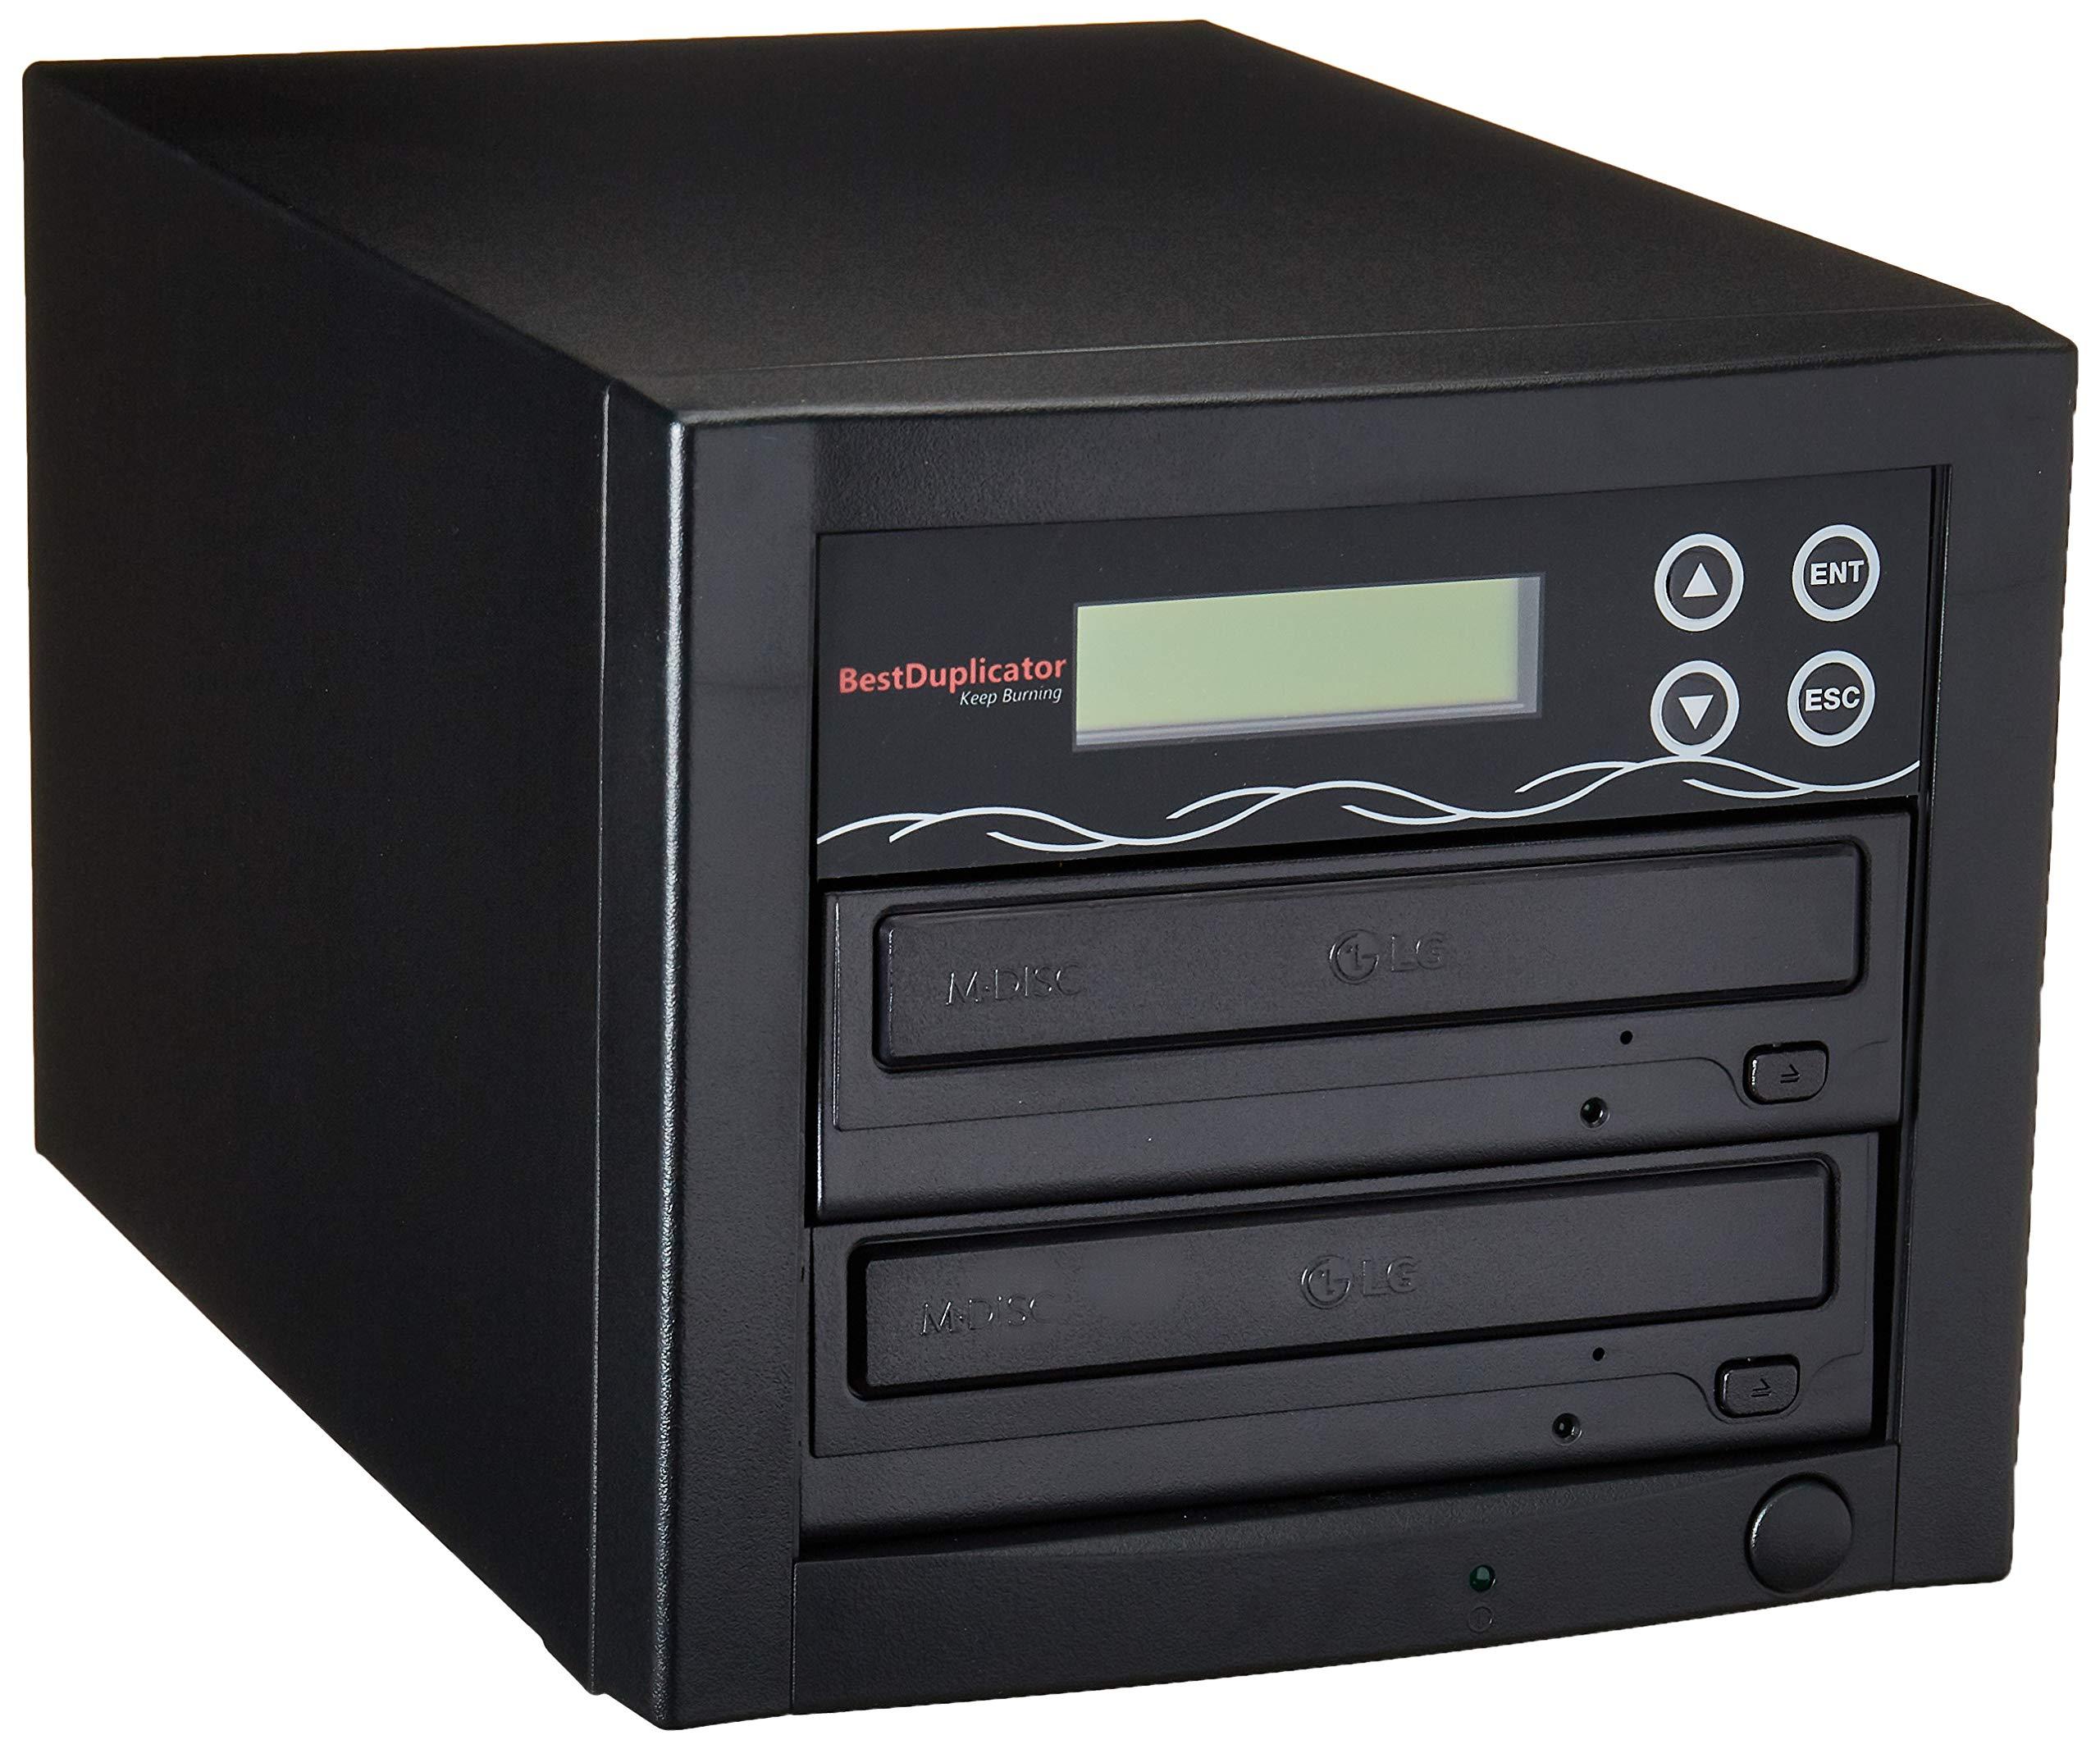 Bestduplicator BD-SMG-1T 1 Target 24x SATA DVD Duplicator with Built-In M-Disc Support Burner (1 to 1)